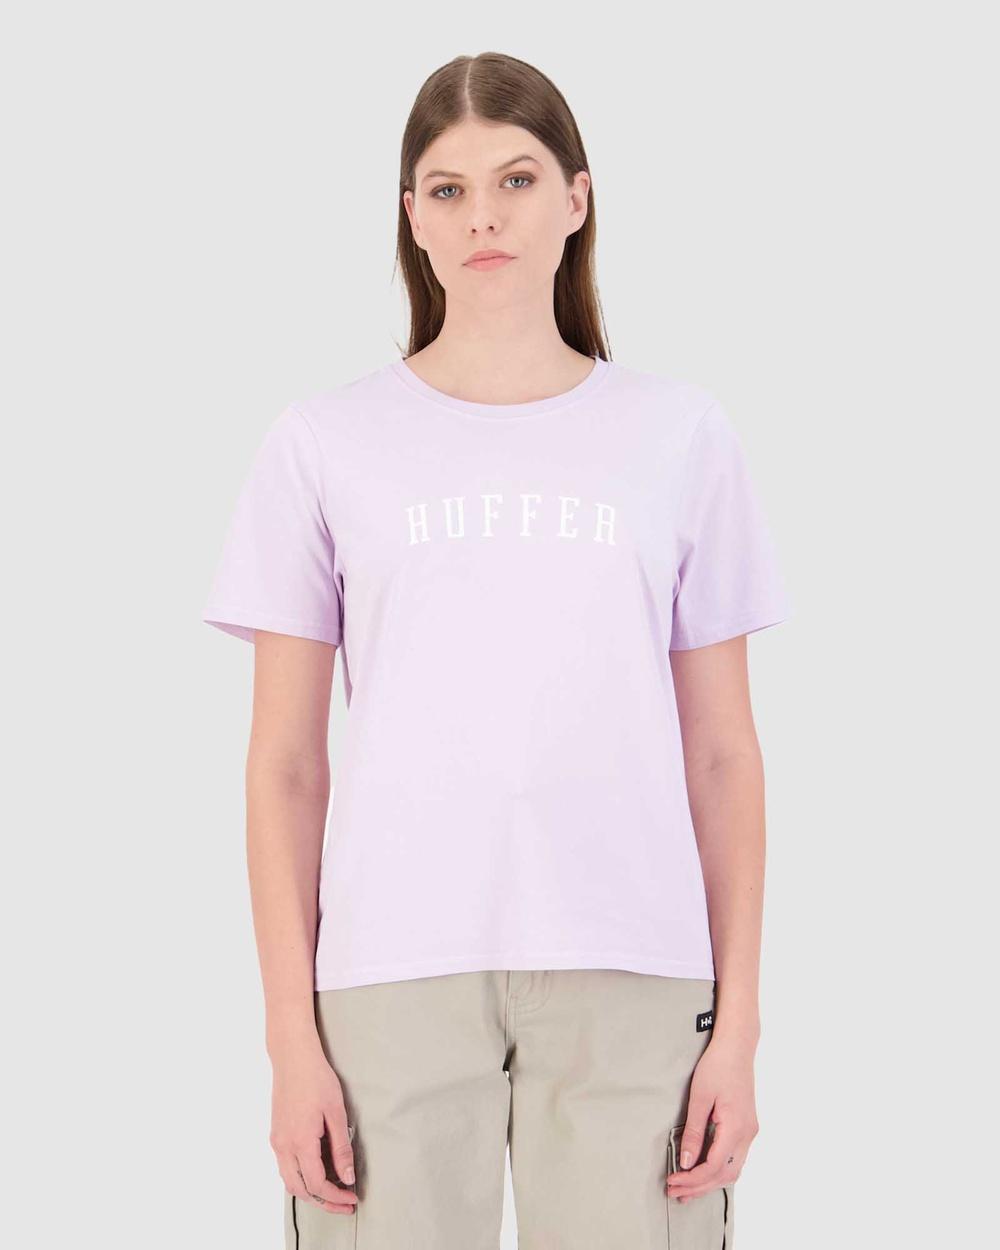 Huffer Women's Stella Tee Stateside T-Shirts & Singlets Purple Tee-Stateside Australia